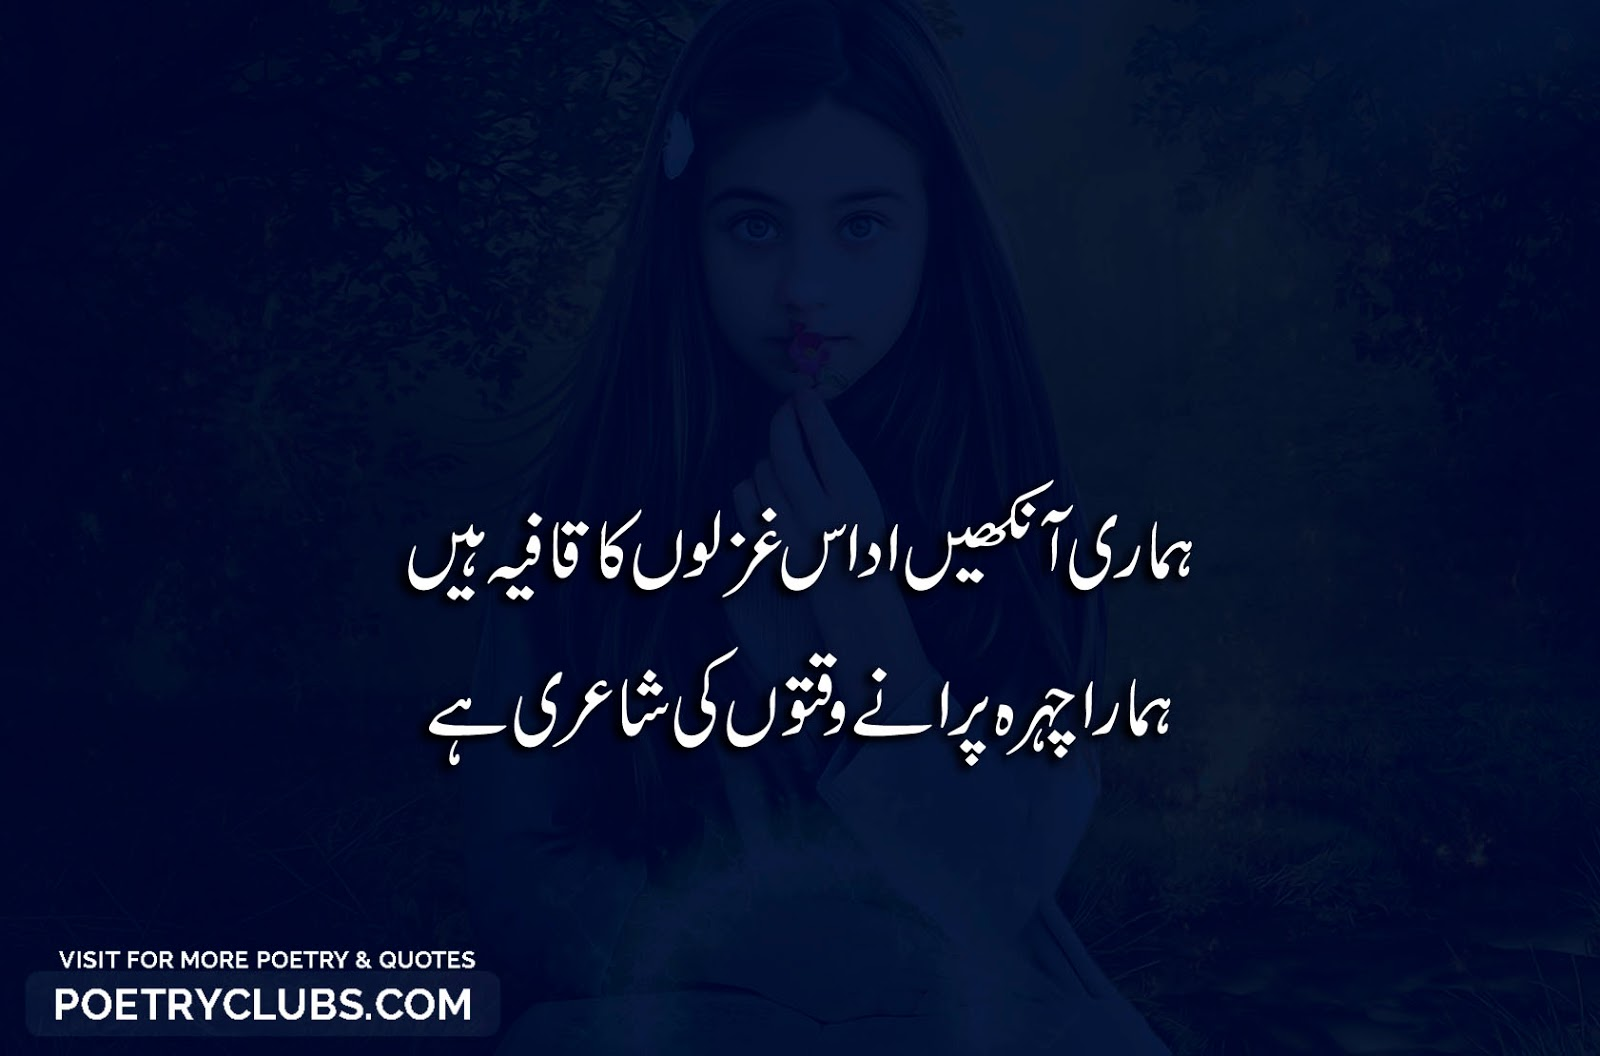 Urdu Love Poetry, Quotes - 2 Lines Romantic, Sad, Love ...